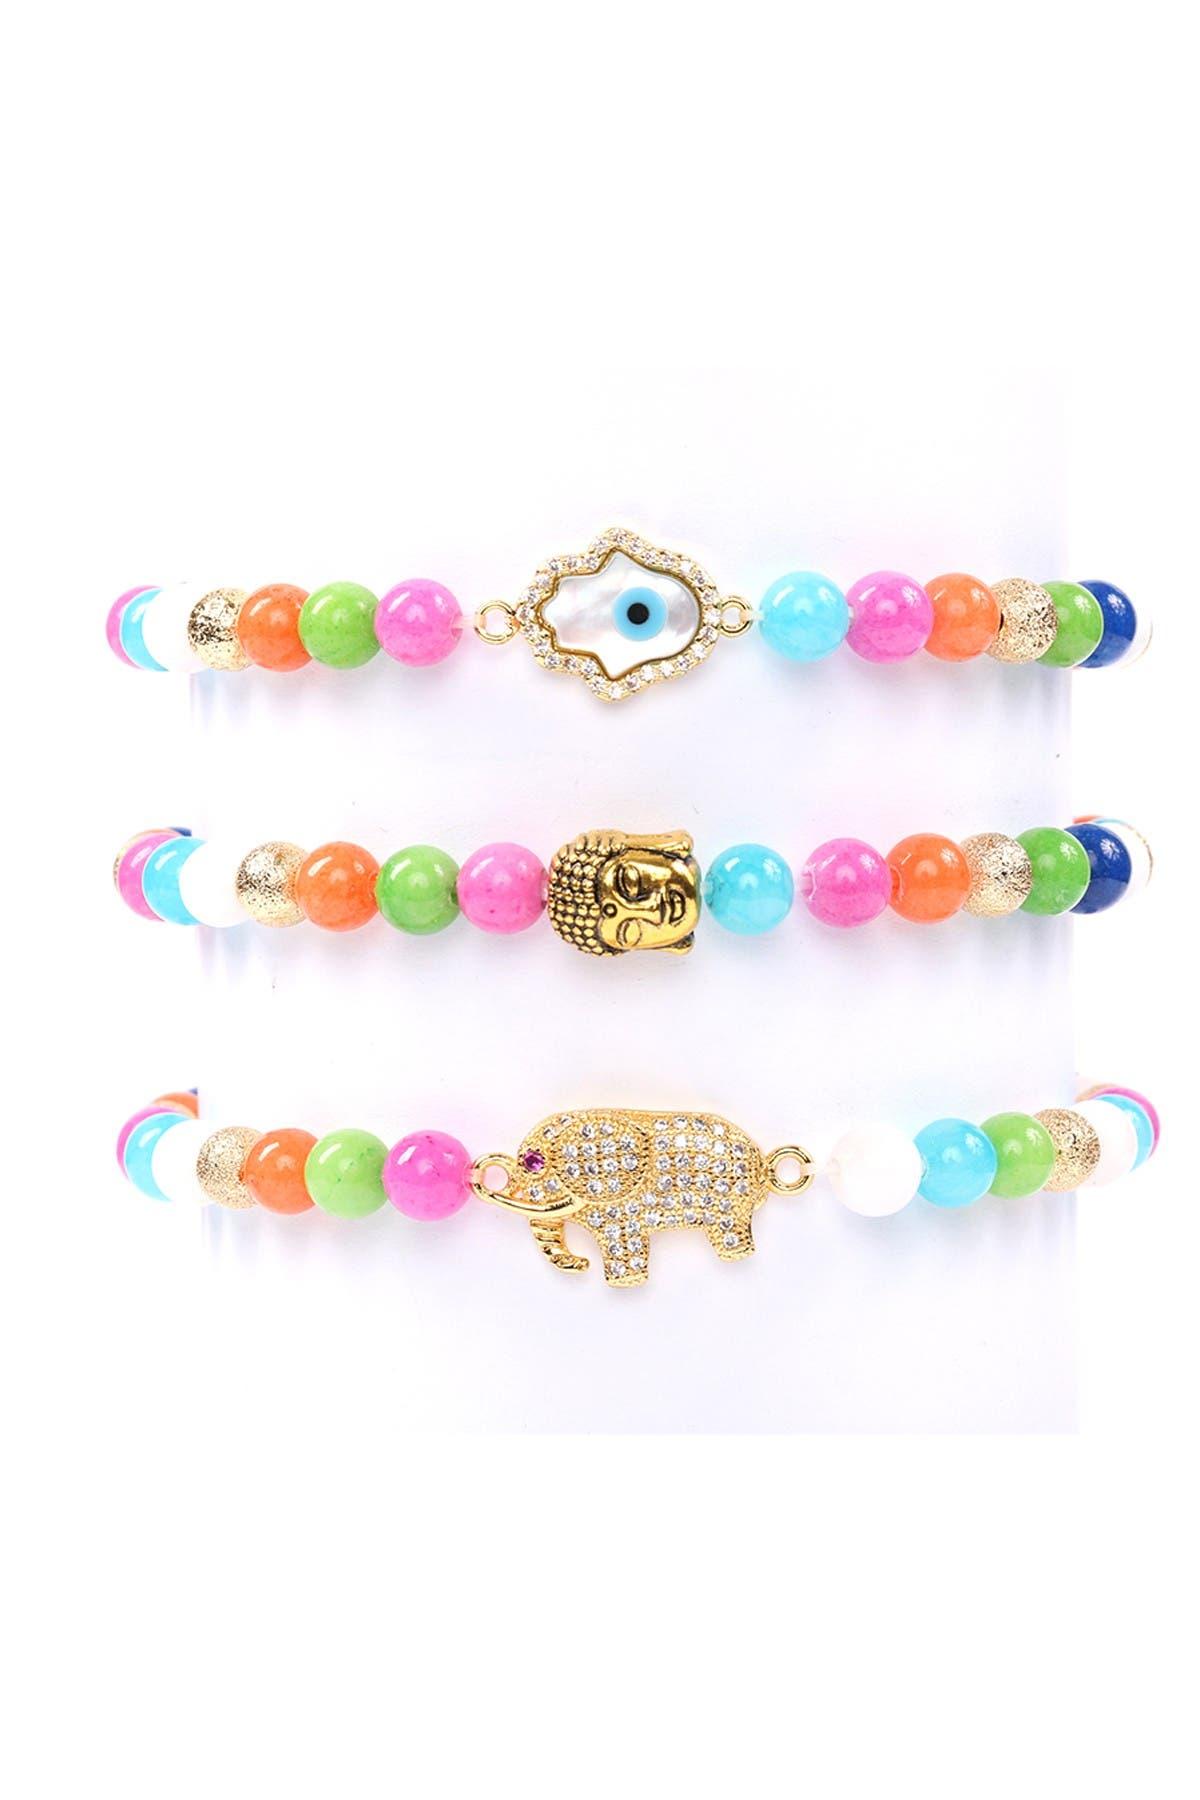 Image of Eye Candy Los Angeles Natural Beaded Rainbow Stone Mixed Charm Beaded Bracelets - Set of 3